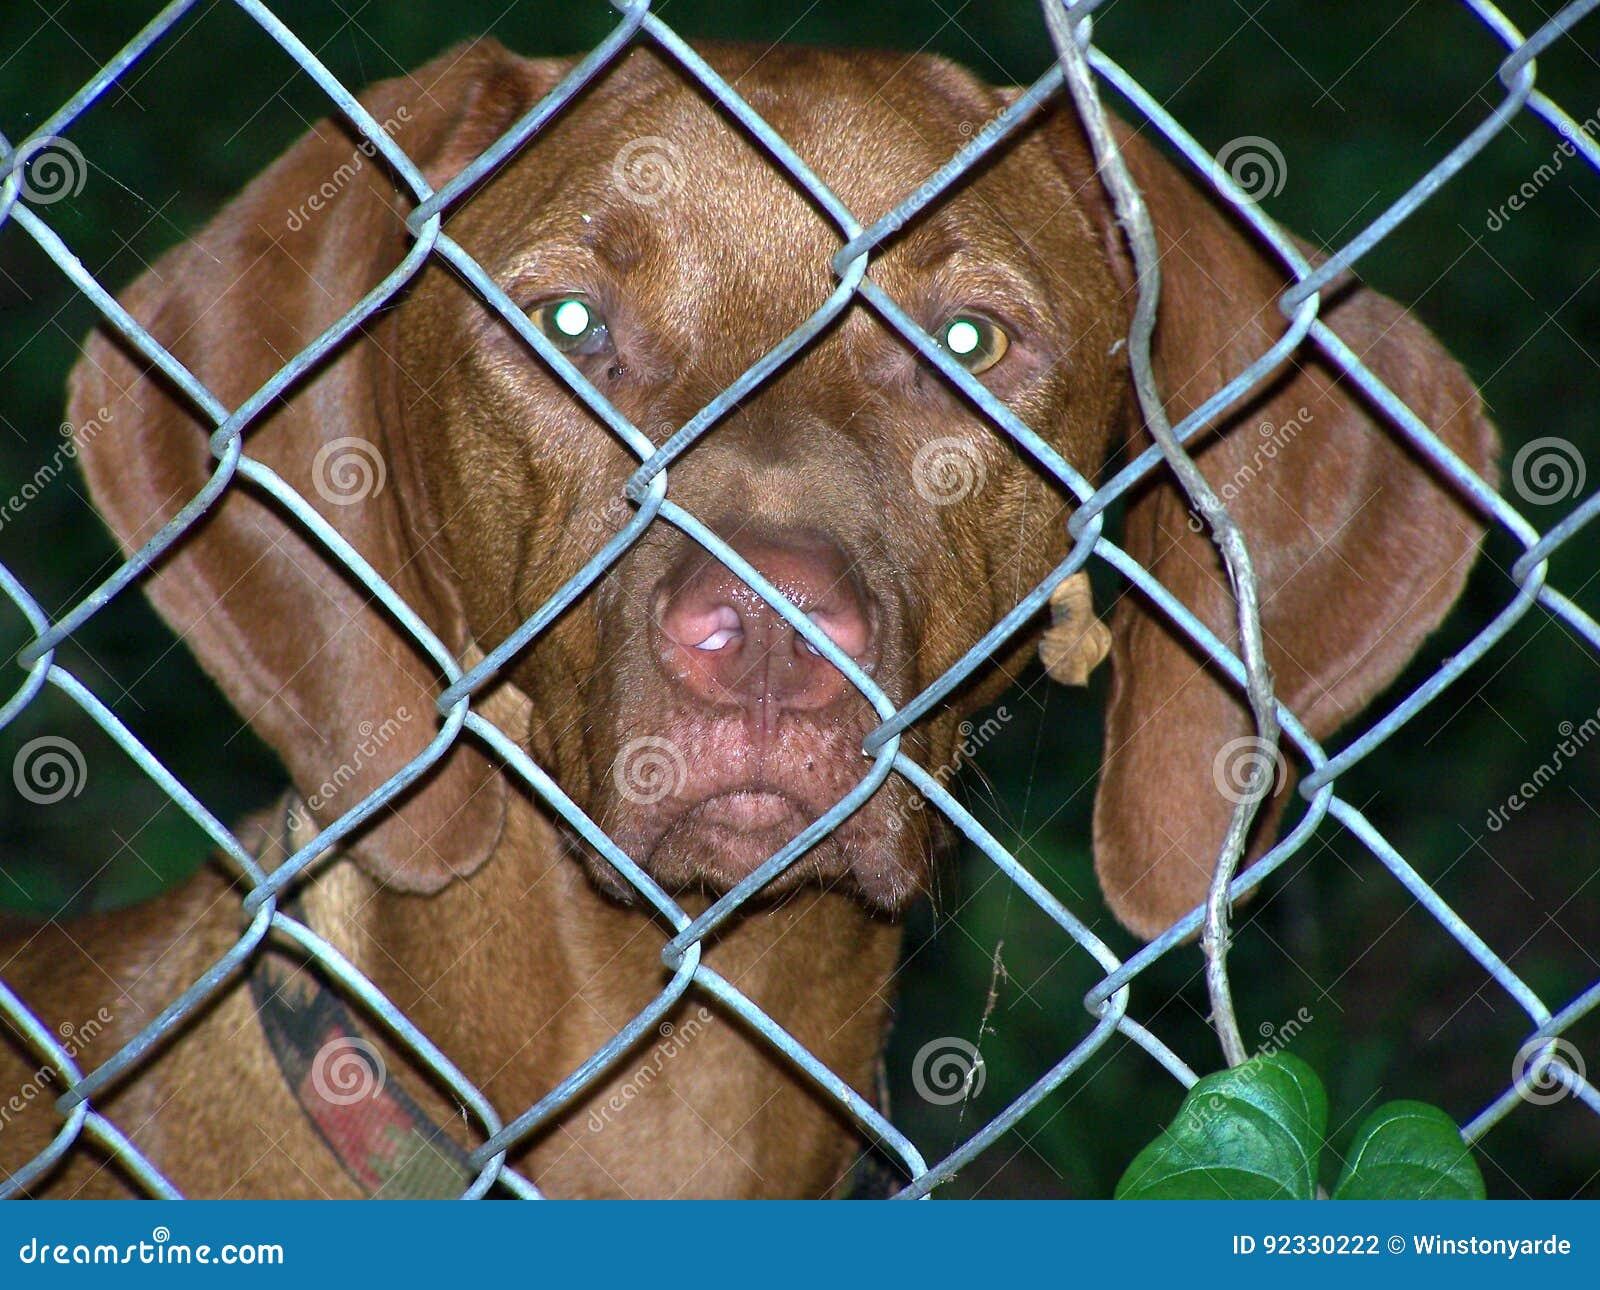 Staket hundstaket : Bak Hundstaket Arkivfoto - Bild: 92330222